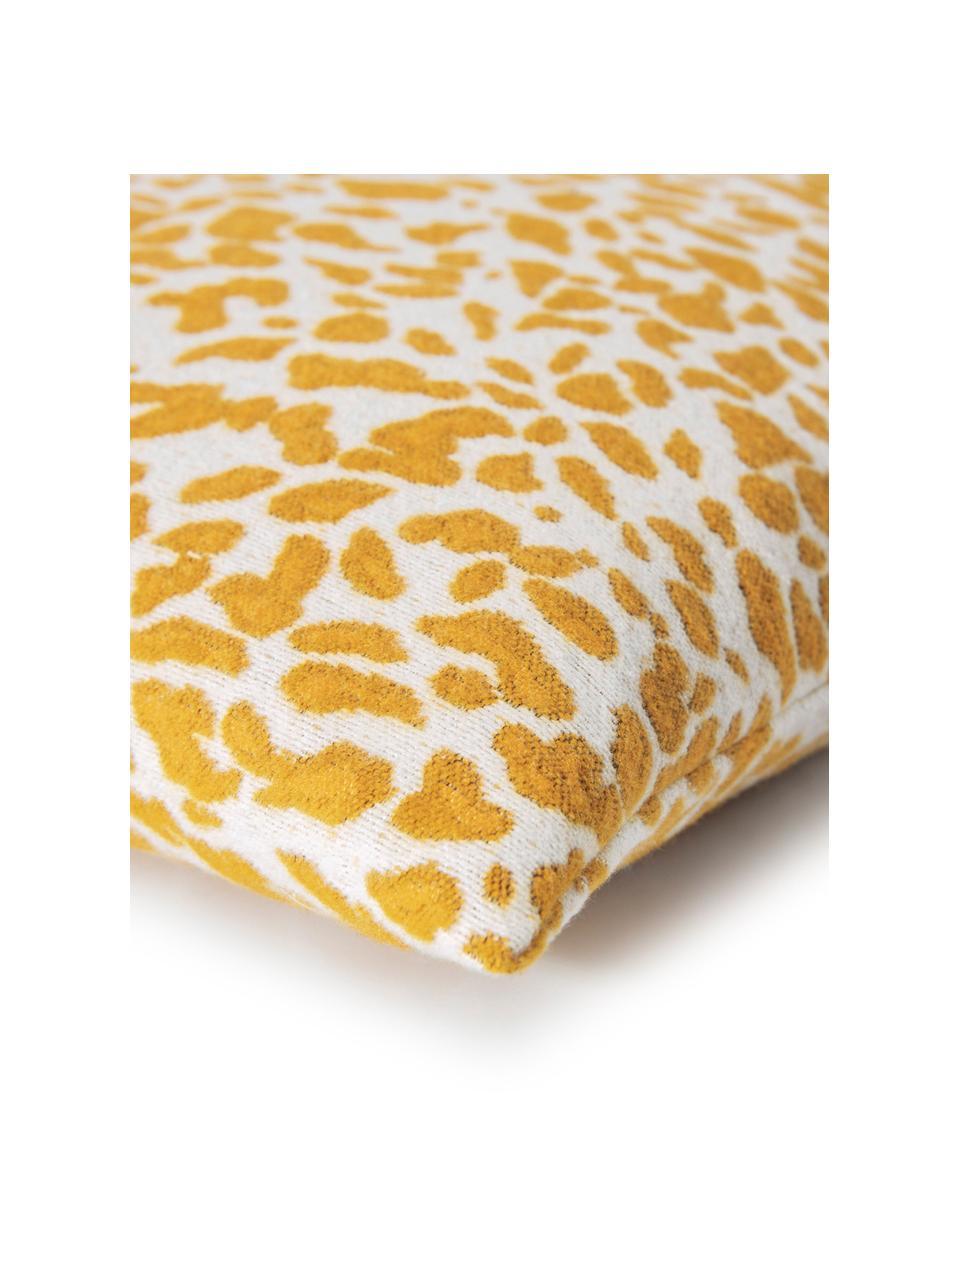 Kissenhülle Sana mit Leoparden-Print in Gelb/Weiß, Webart: Jacquard, Senfgelb, Weiß, 50 x 50 cm